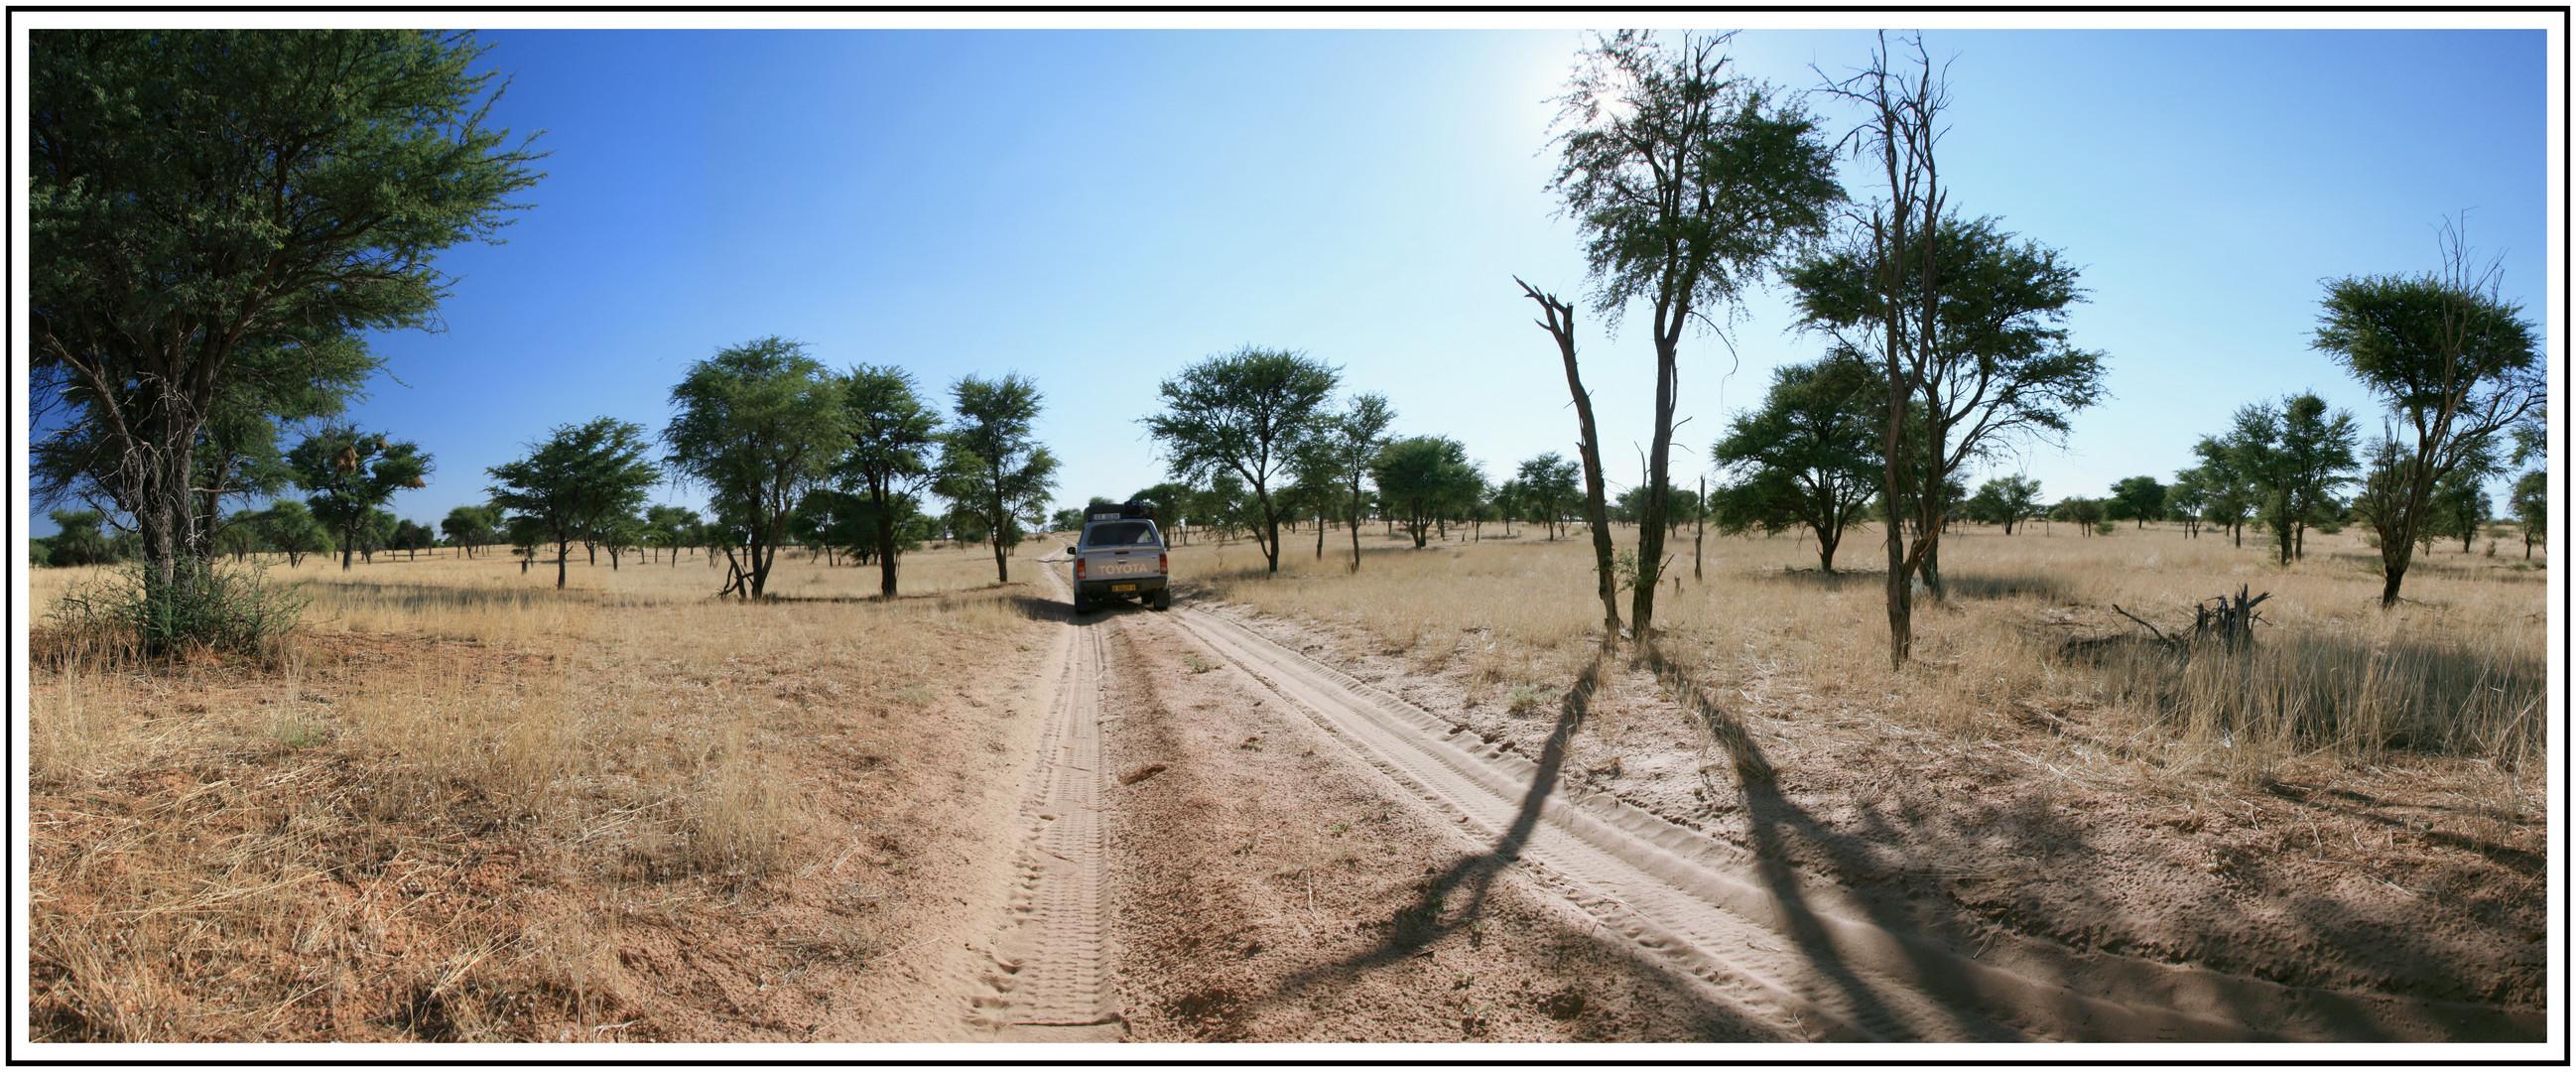 Botswana - KTP Richtung Kaa Gate